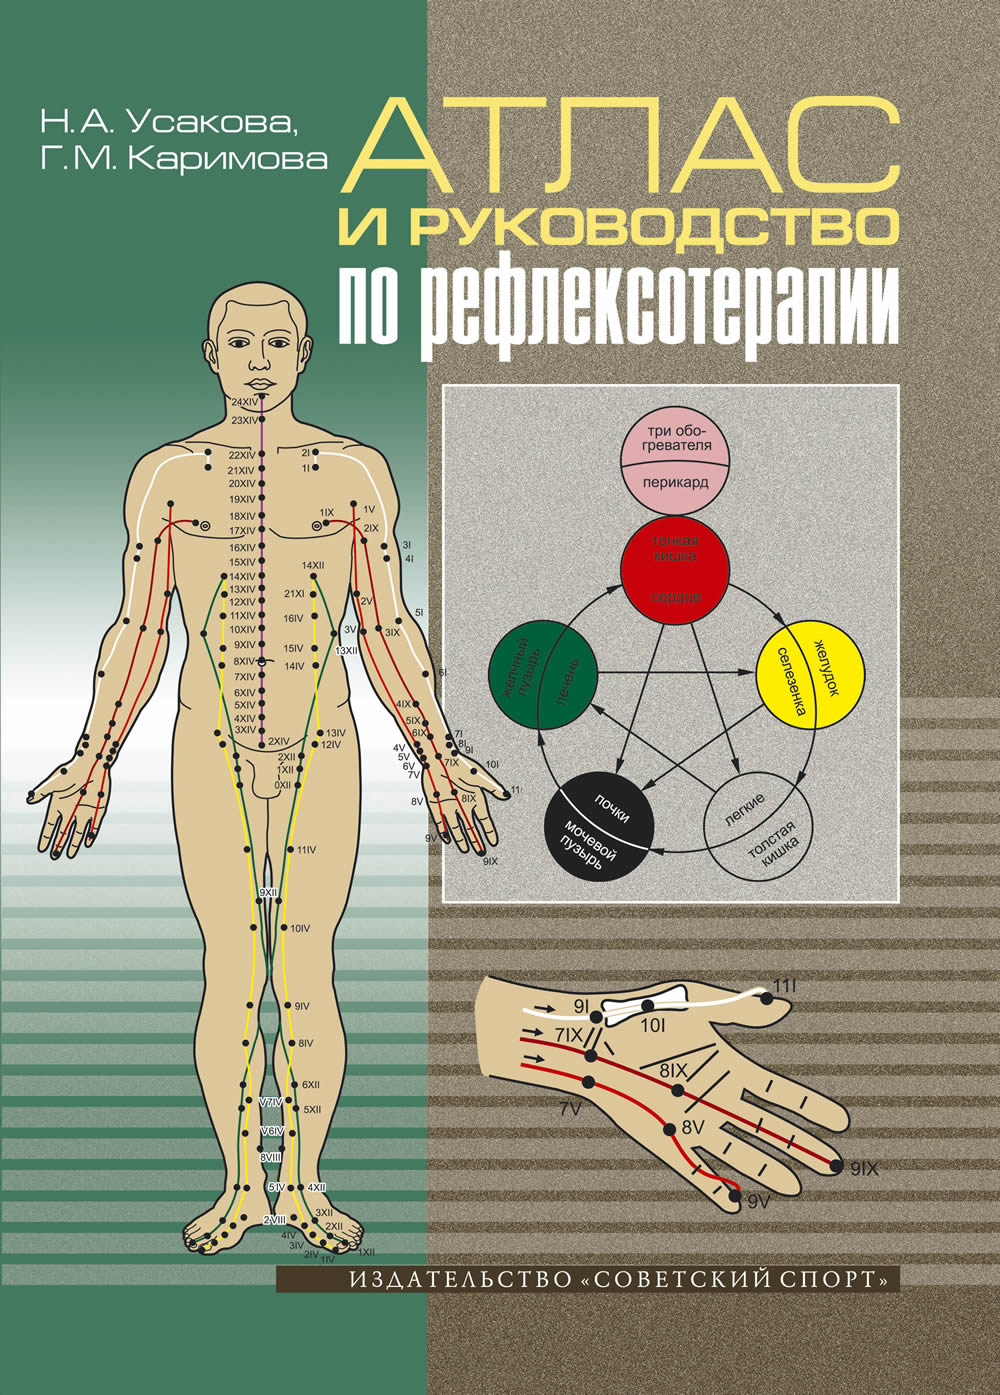 Руководство по рефлексотерапии